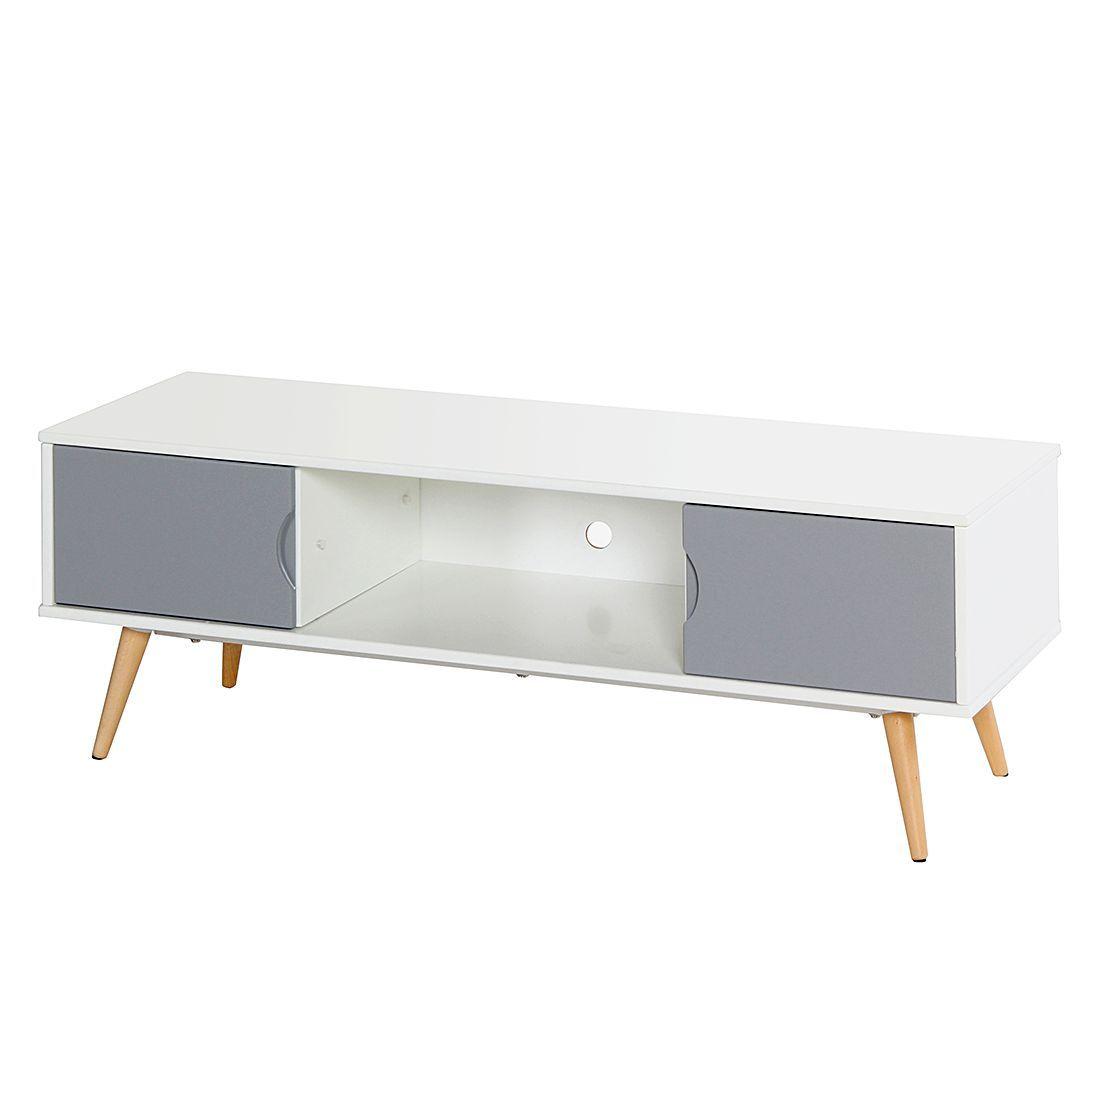 Morteens Möbel tv lowboard stan weiß grau morteens jetzt bestellen unter https